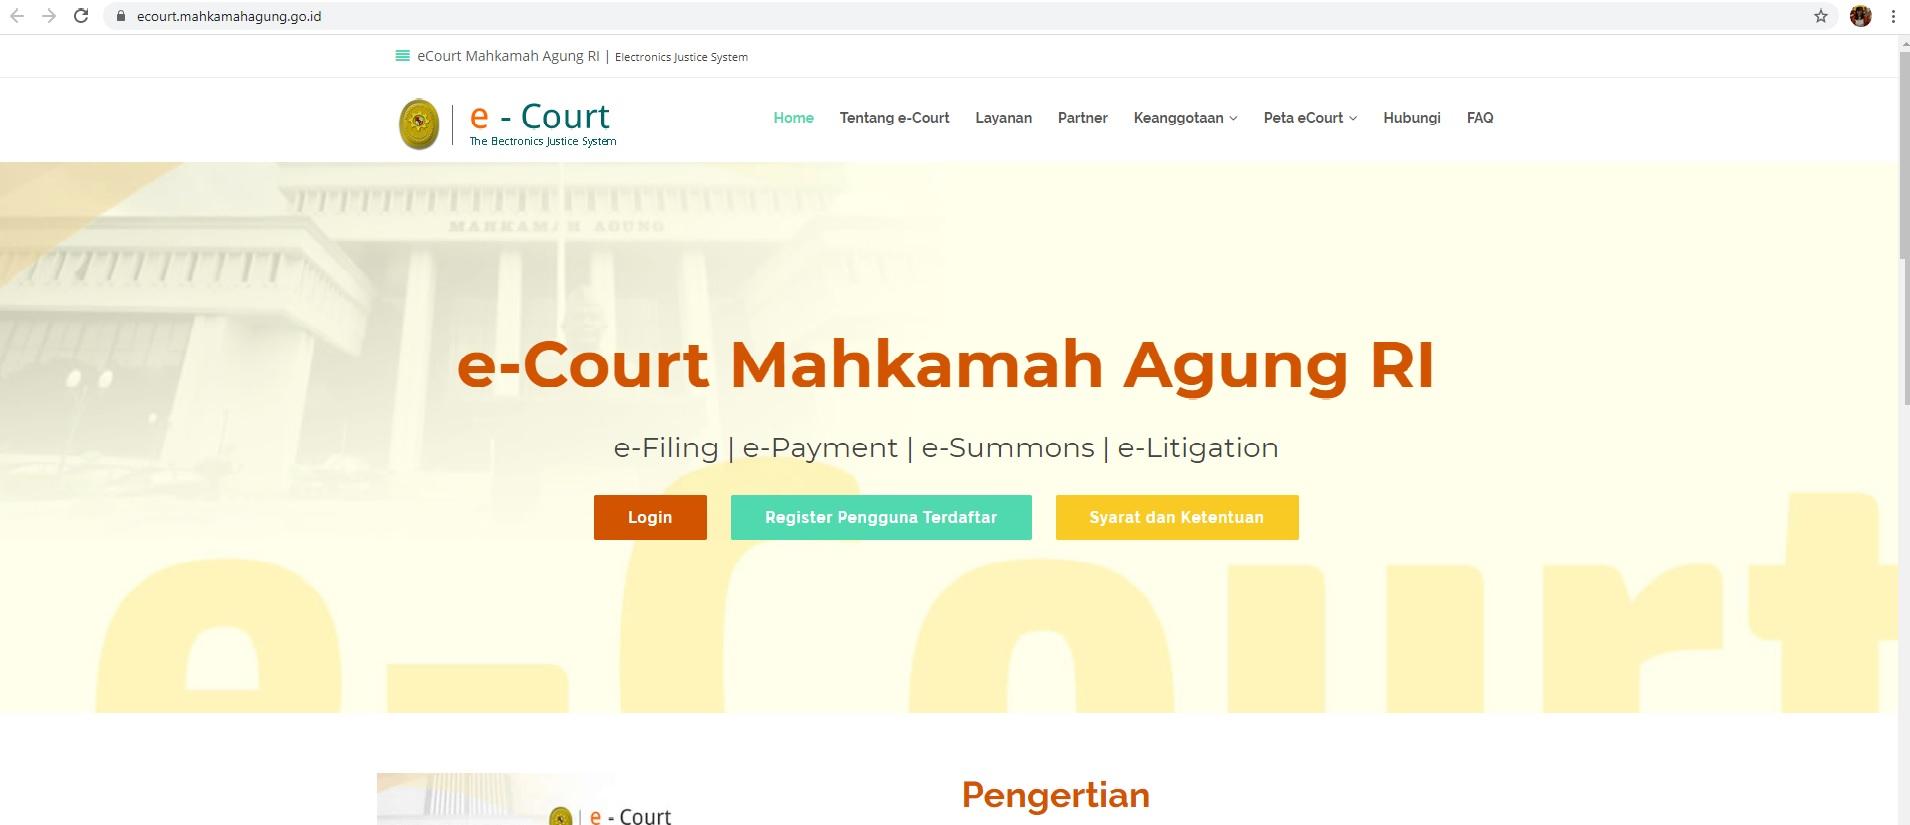 Era Baru Beracara di Pengadilan Melalui Sistem E-court